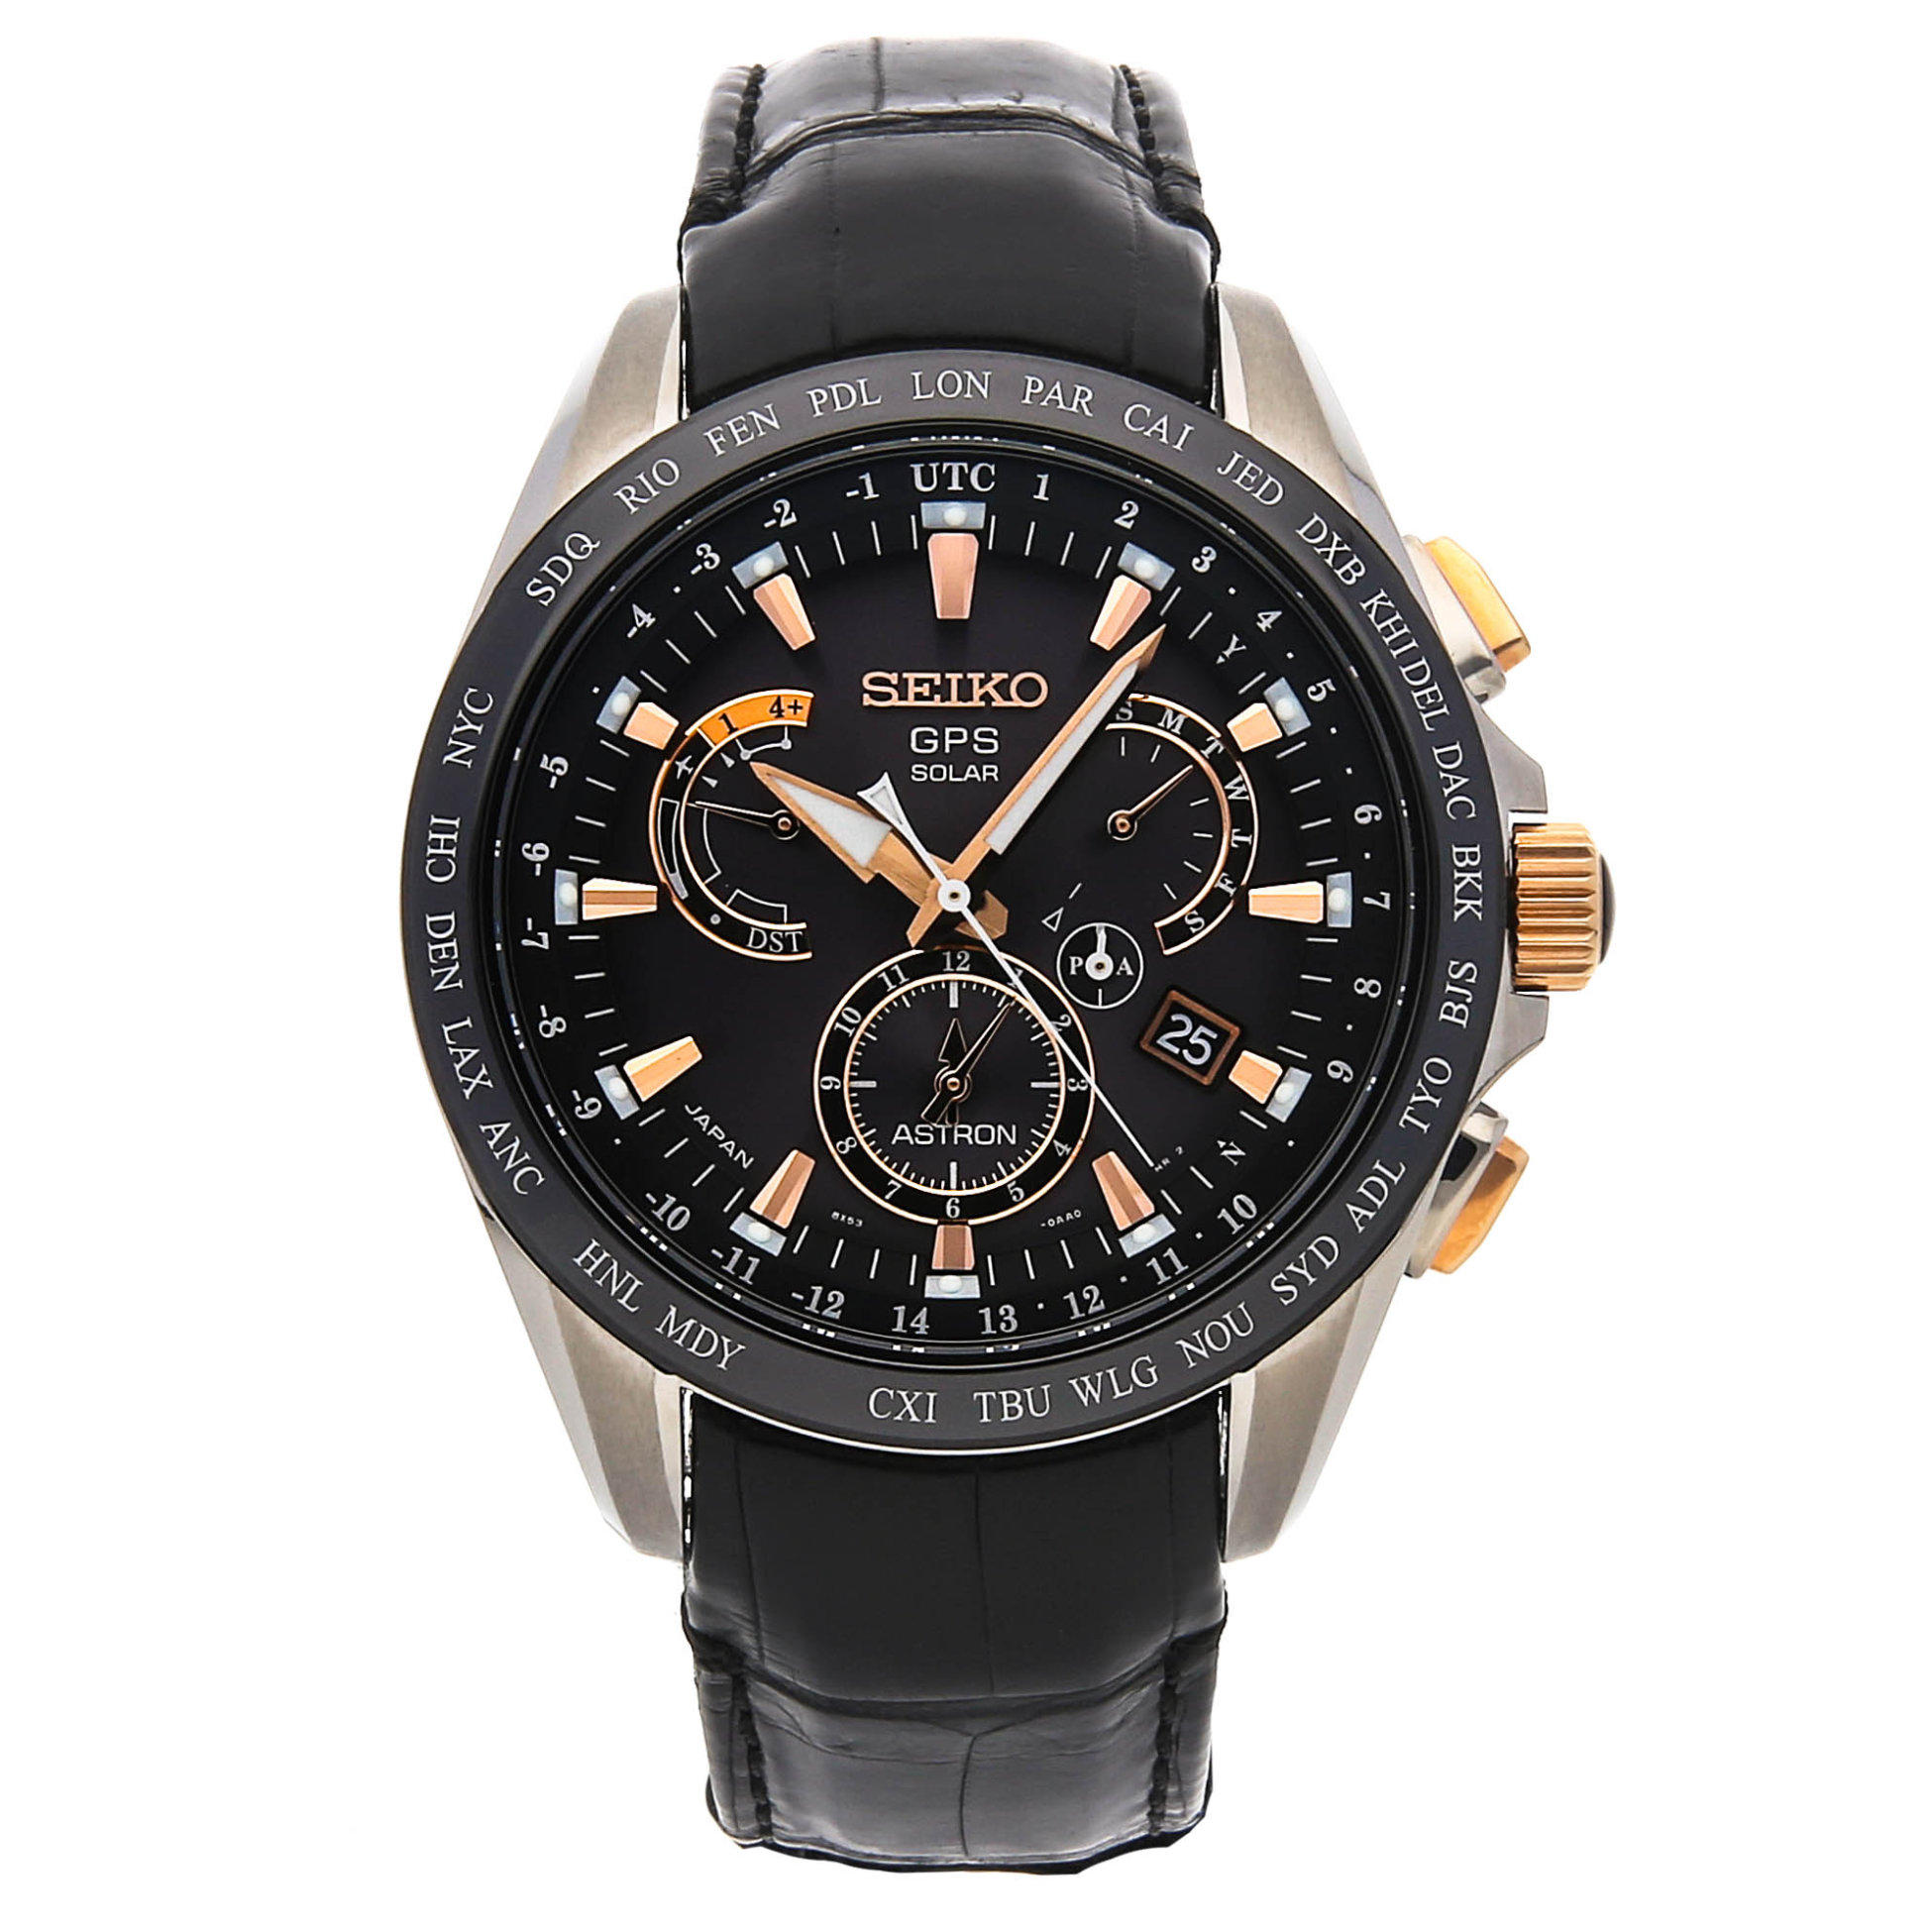 Seiko Astron GPS Watch Watchbox Global